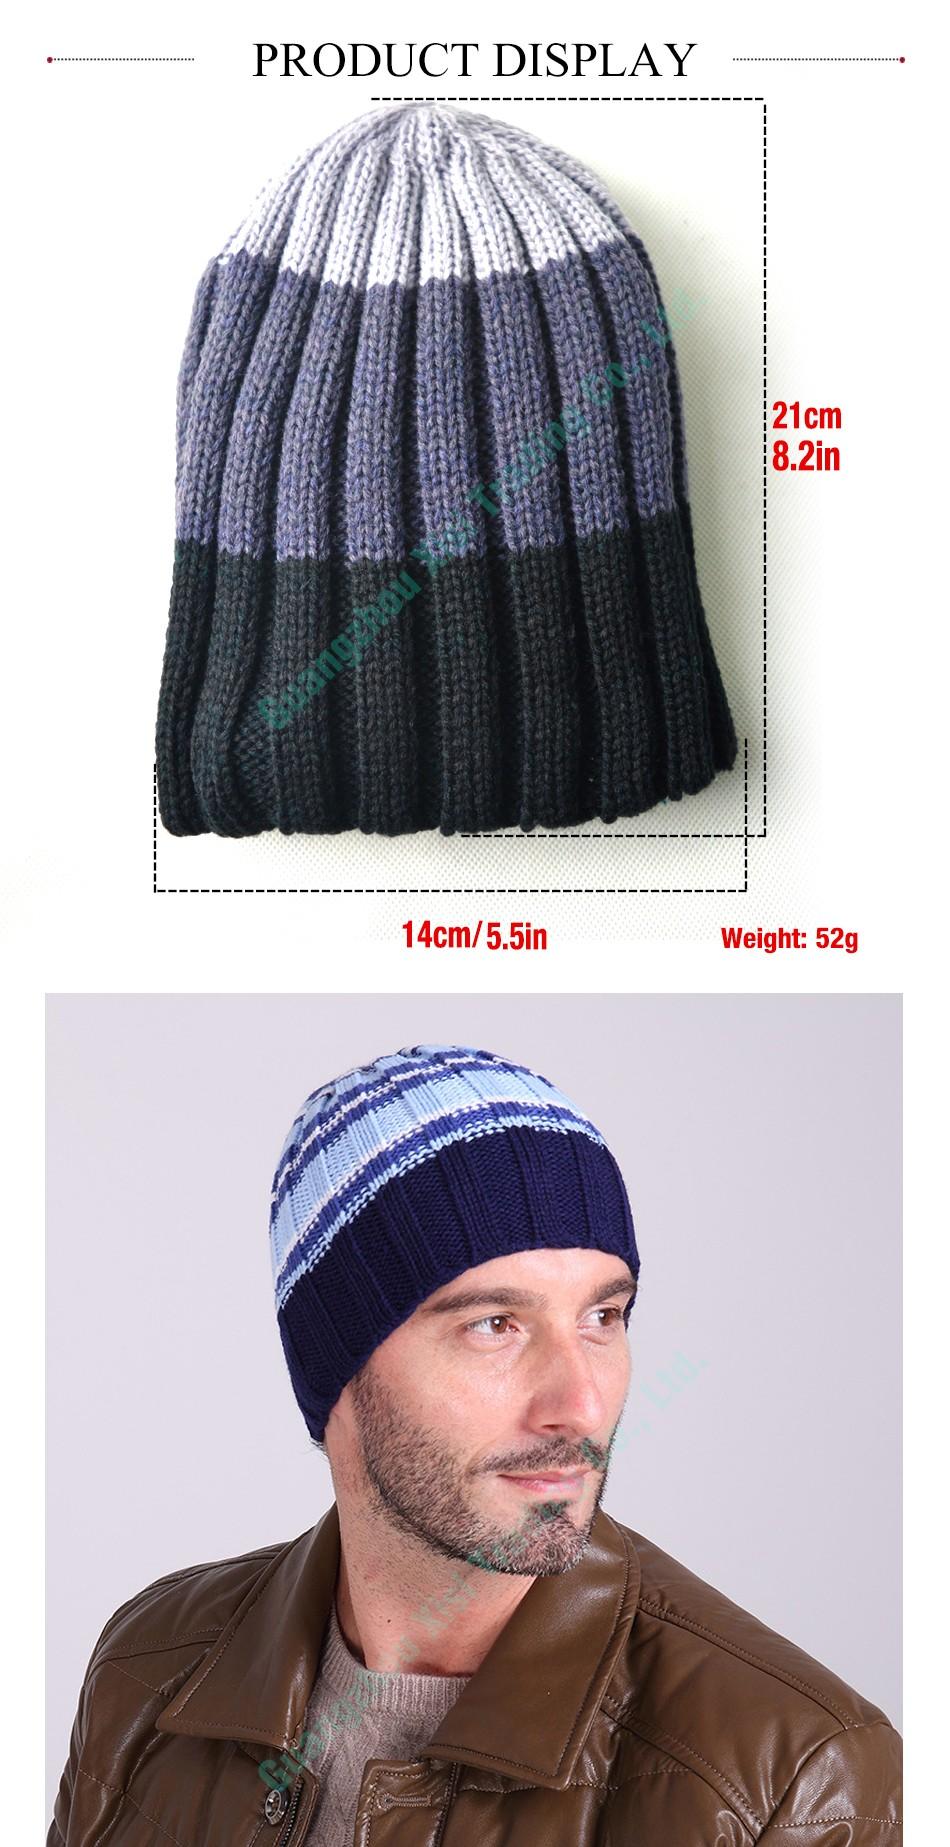 Spring Women Men Unisex Knitted Winter Cap Casual Beanies Solid Color  Hip-Hop Snap Slouch Skullies Bonnet Beanie. aa bb cc dd ee ff gg. Hat Gorro 723b880ea11d